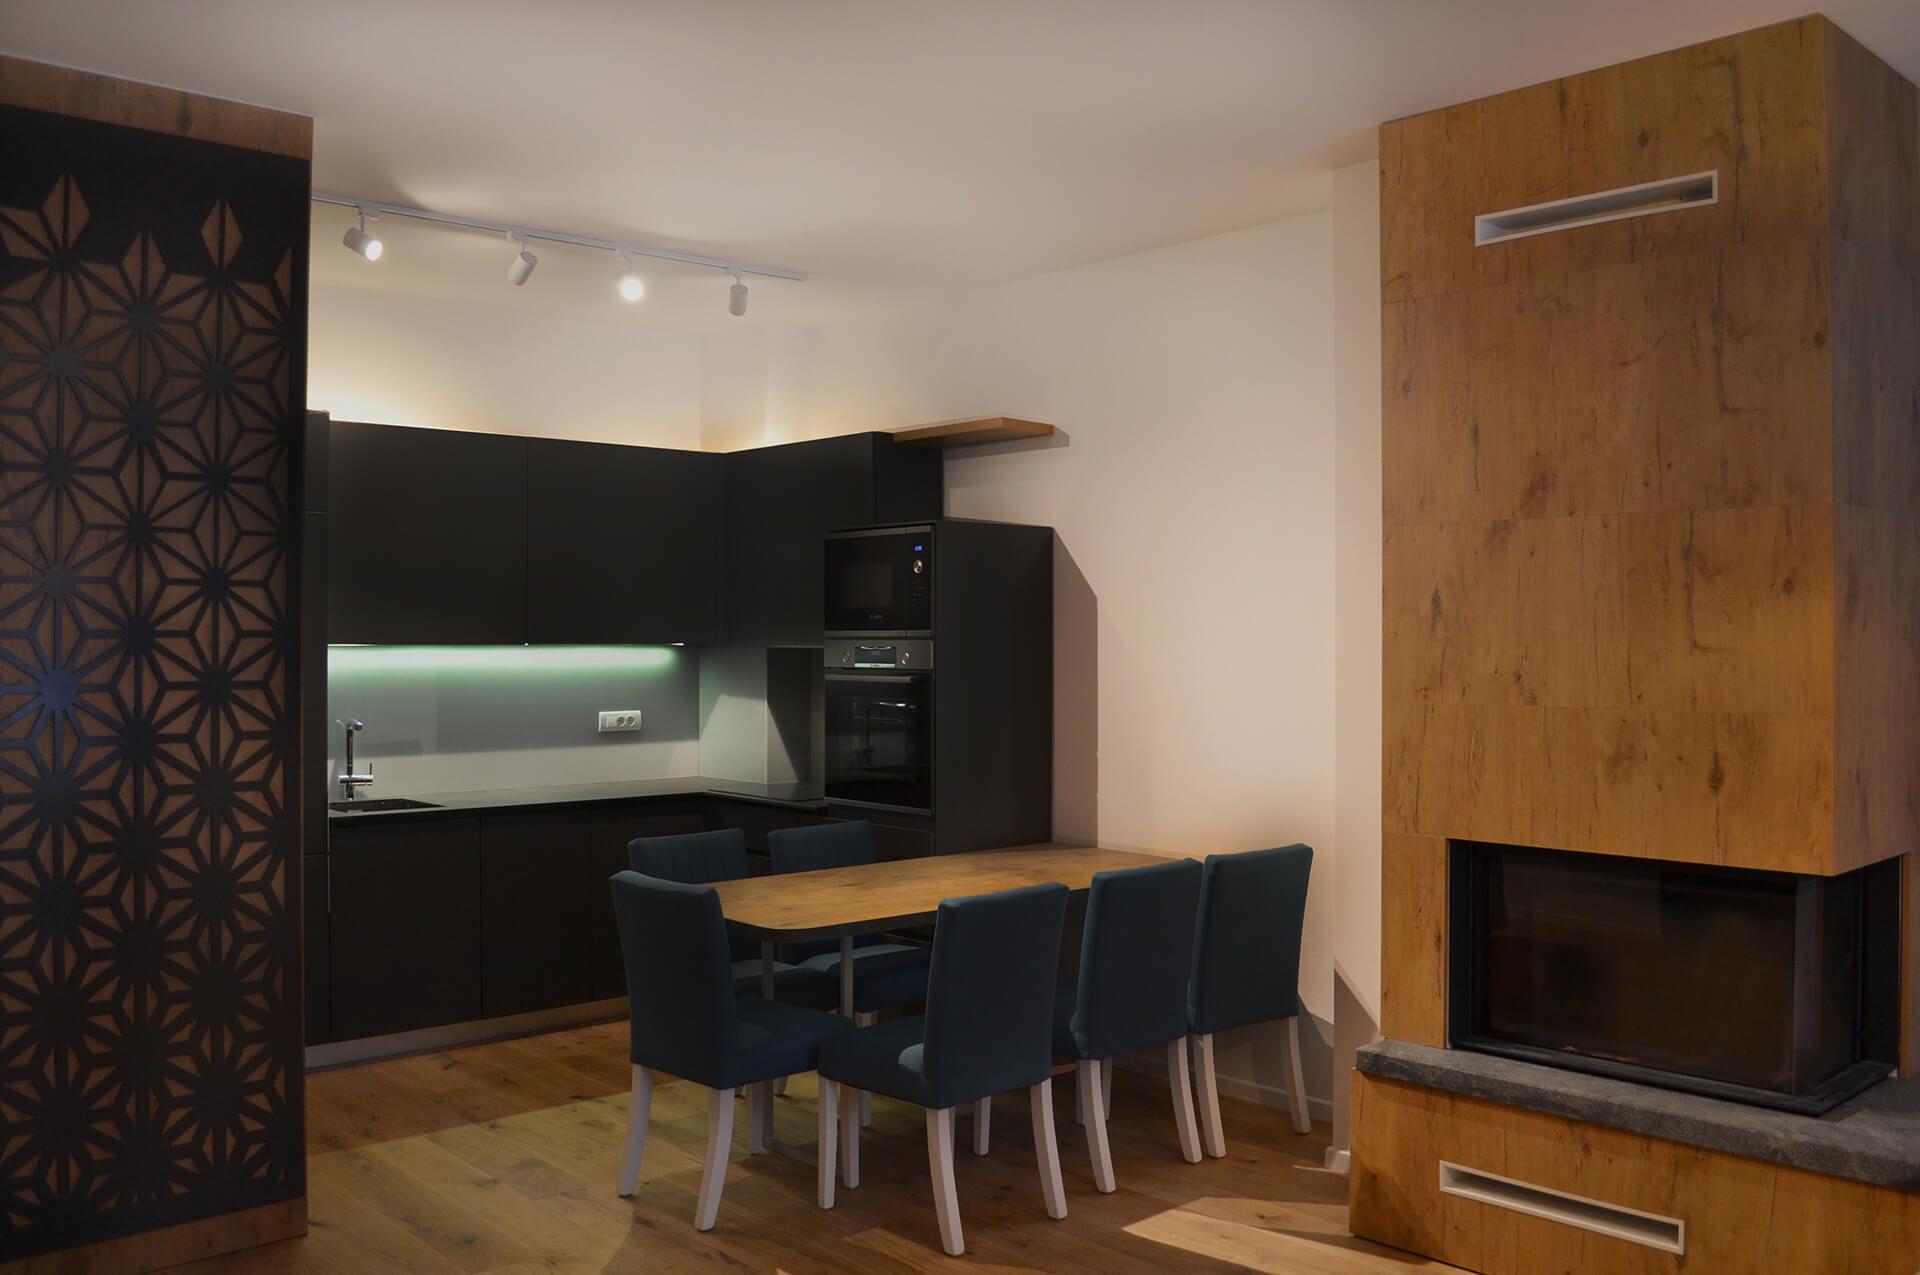 nova-ambienta-kuhinje-kuhinja od oplemenjenog iverala-2